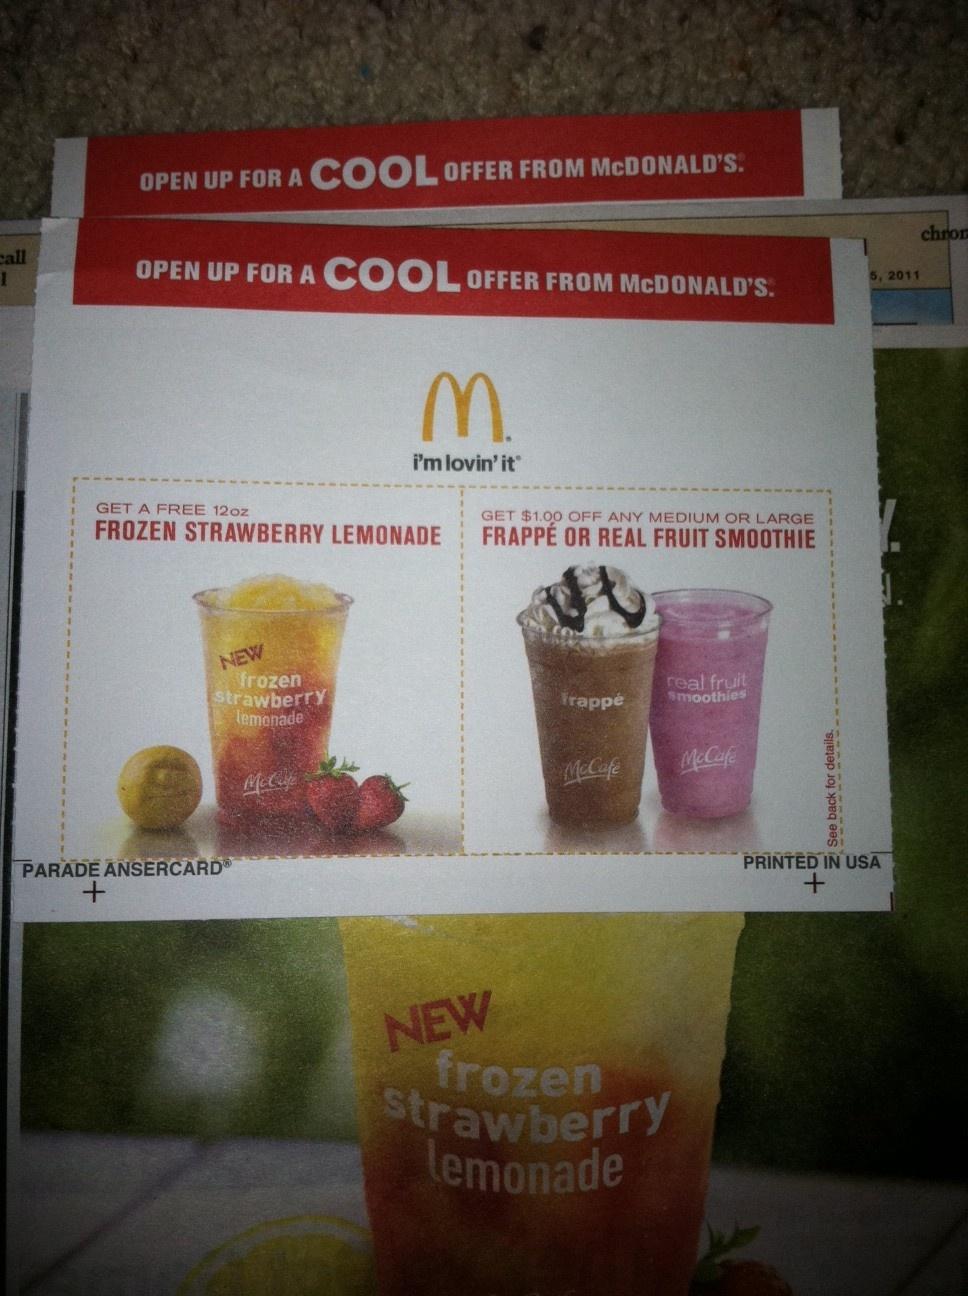 Make Sure To Check The Parade Magazine! Mcdonalds Coupons - Free Mcdonalds Smoothie Printable Coupon